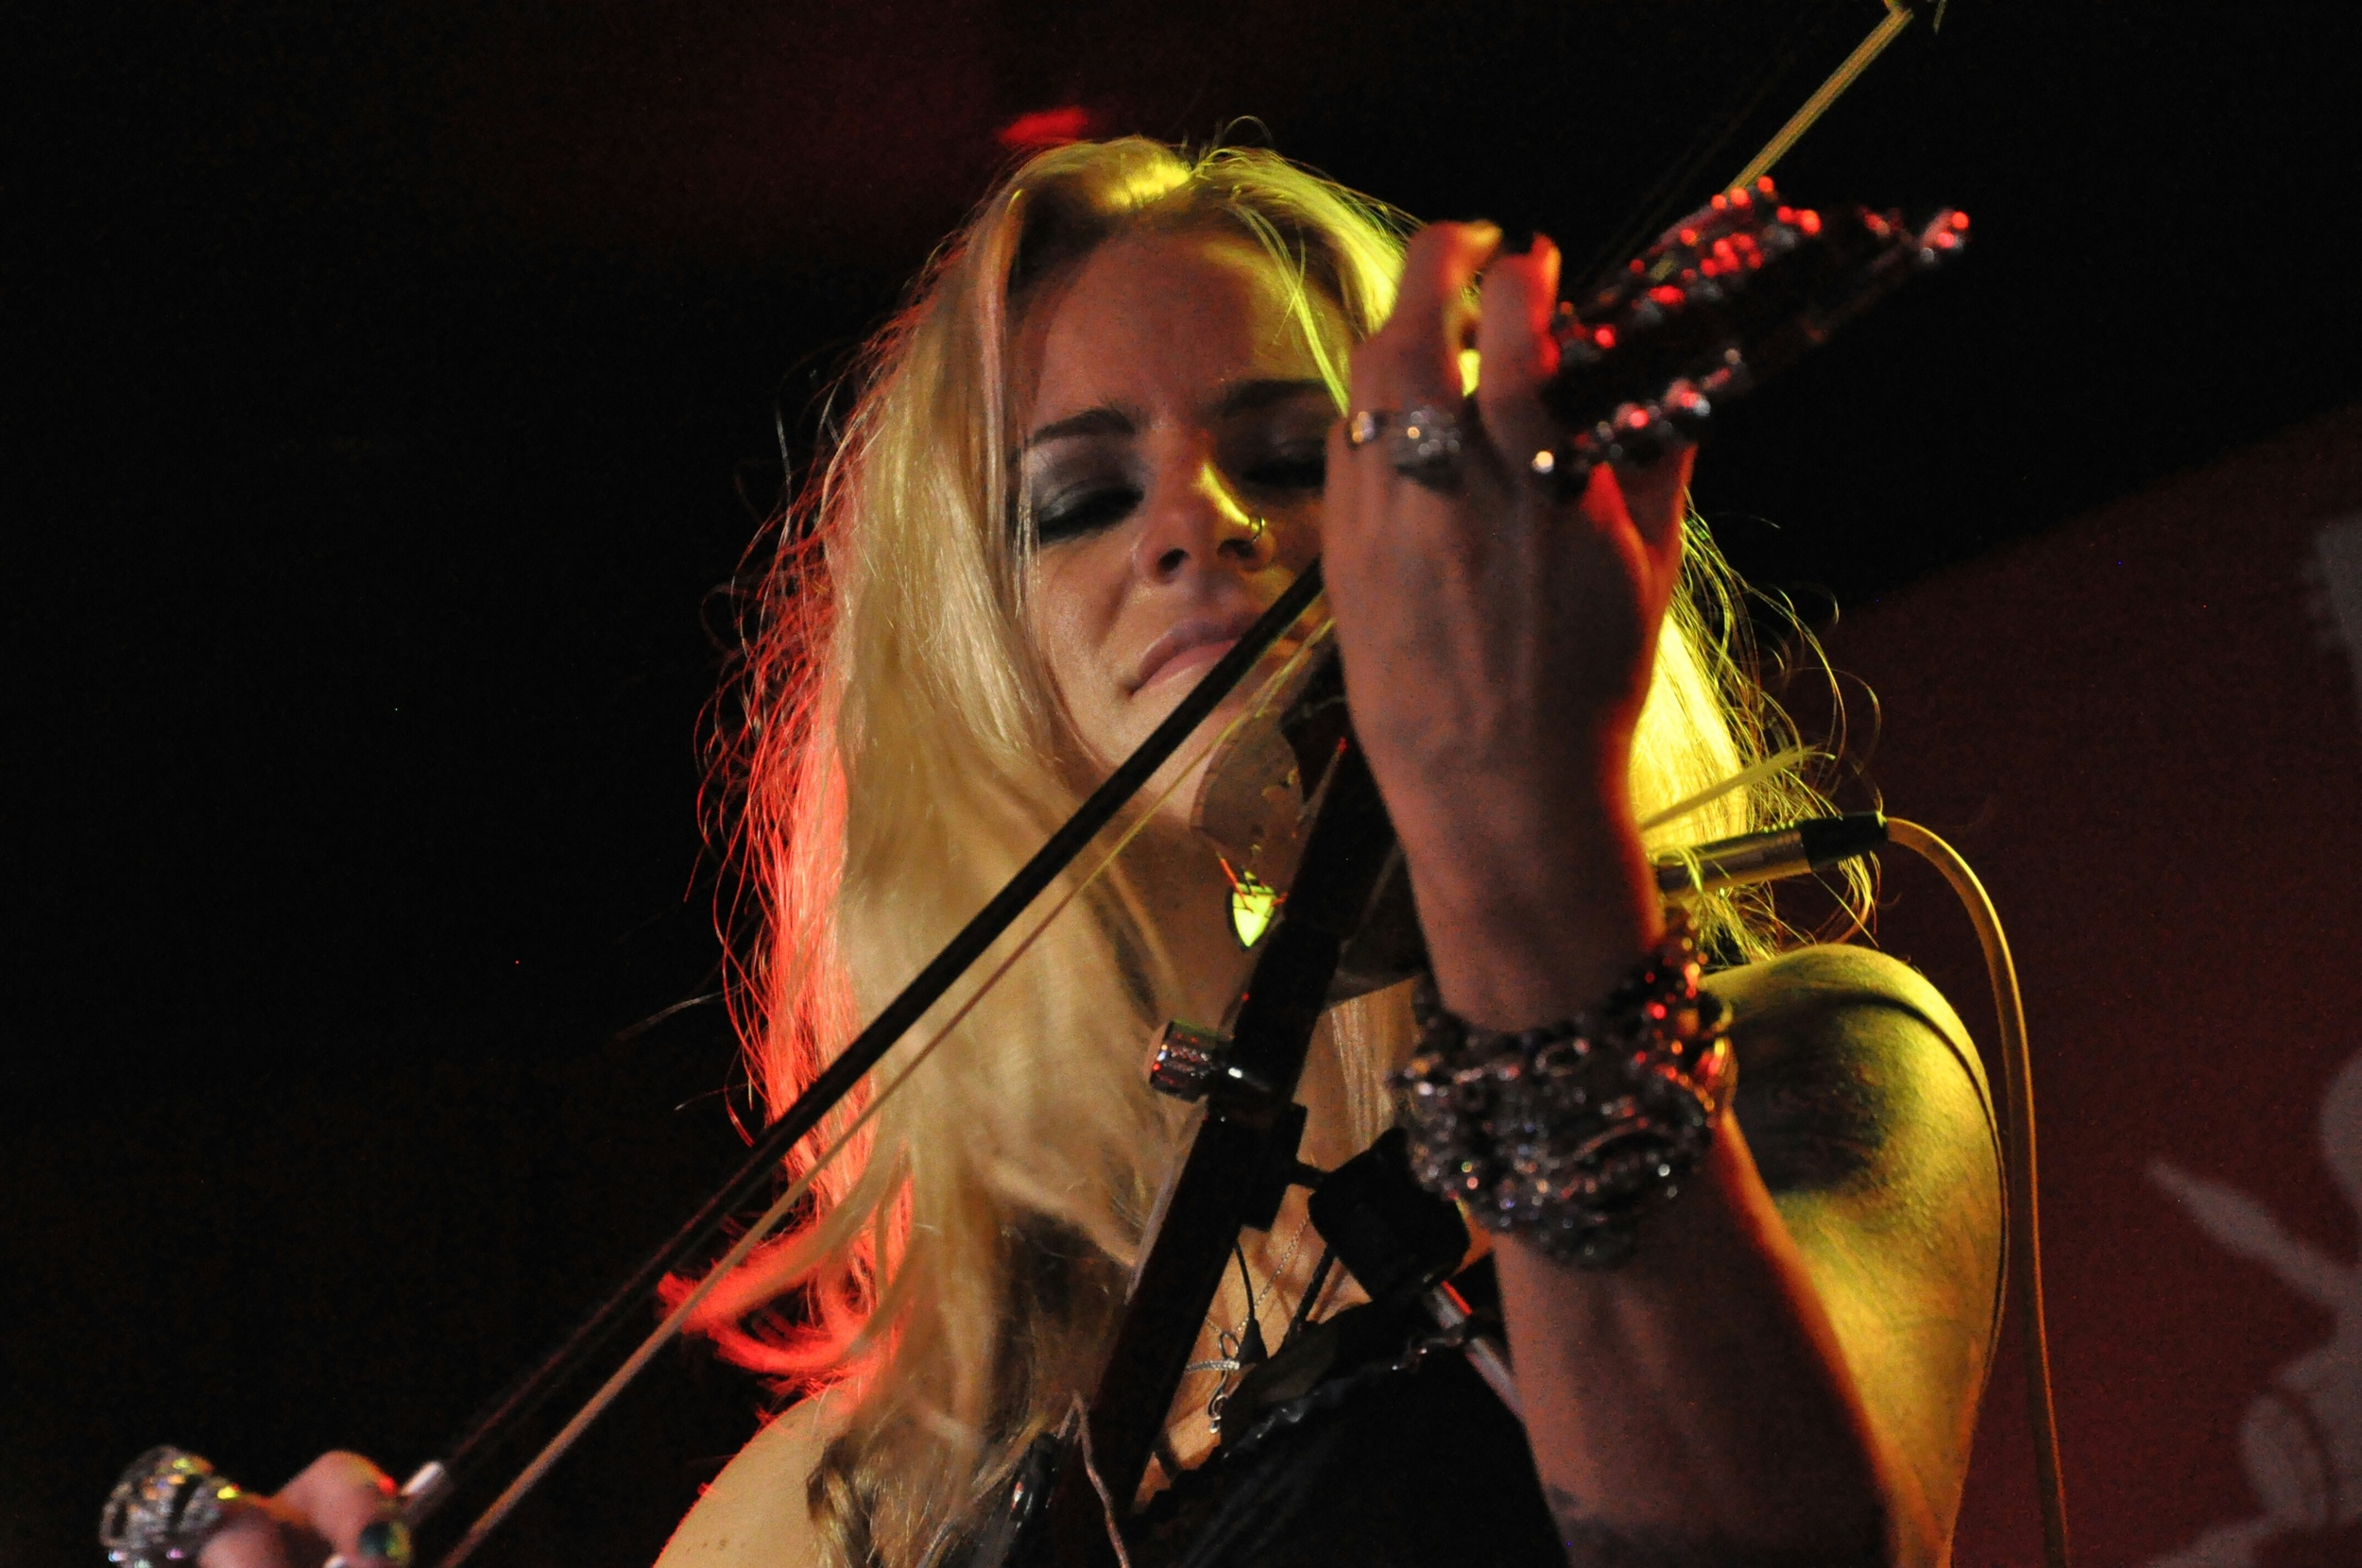 Sally Jo - Violin